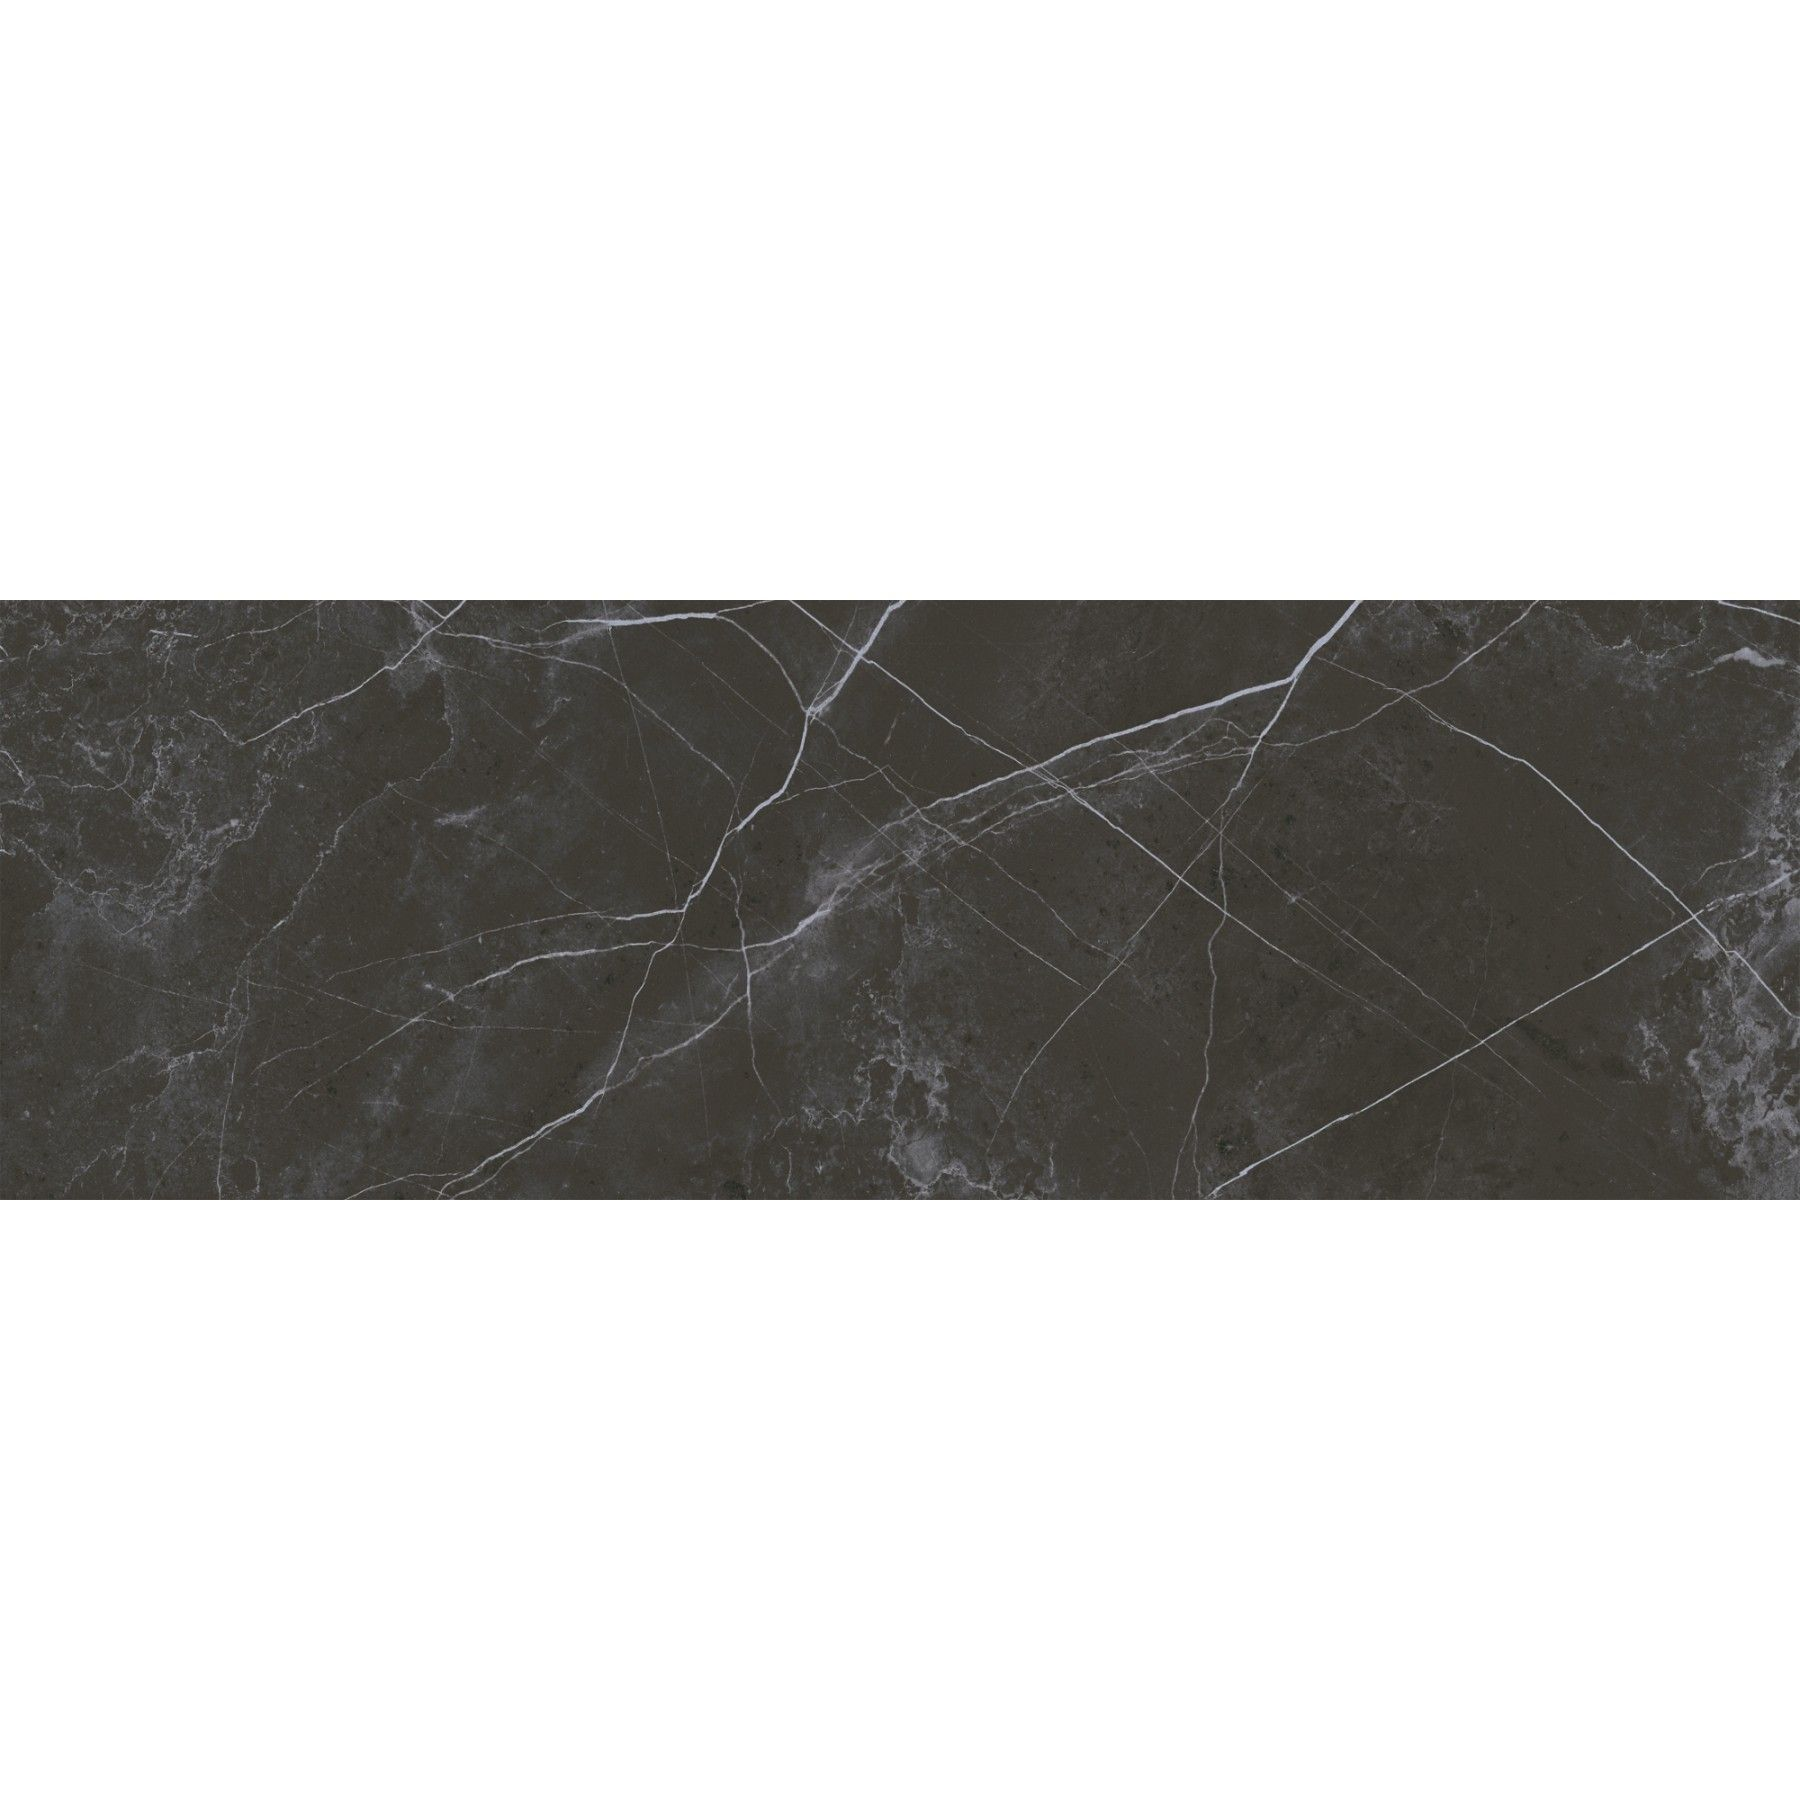 Fliesenwelt Wandfliese Arkit Schwarz Glanzend 40x120cm Jetzt